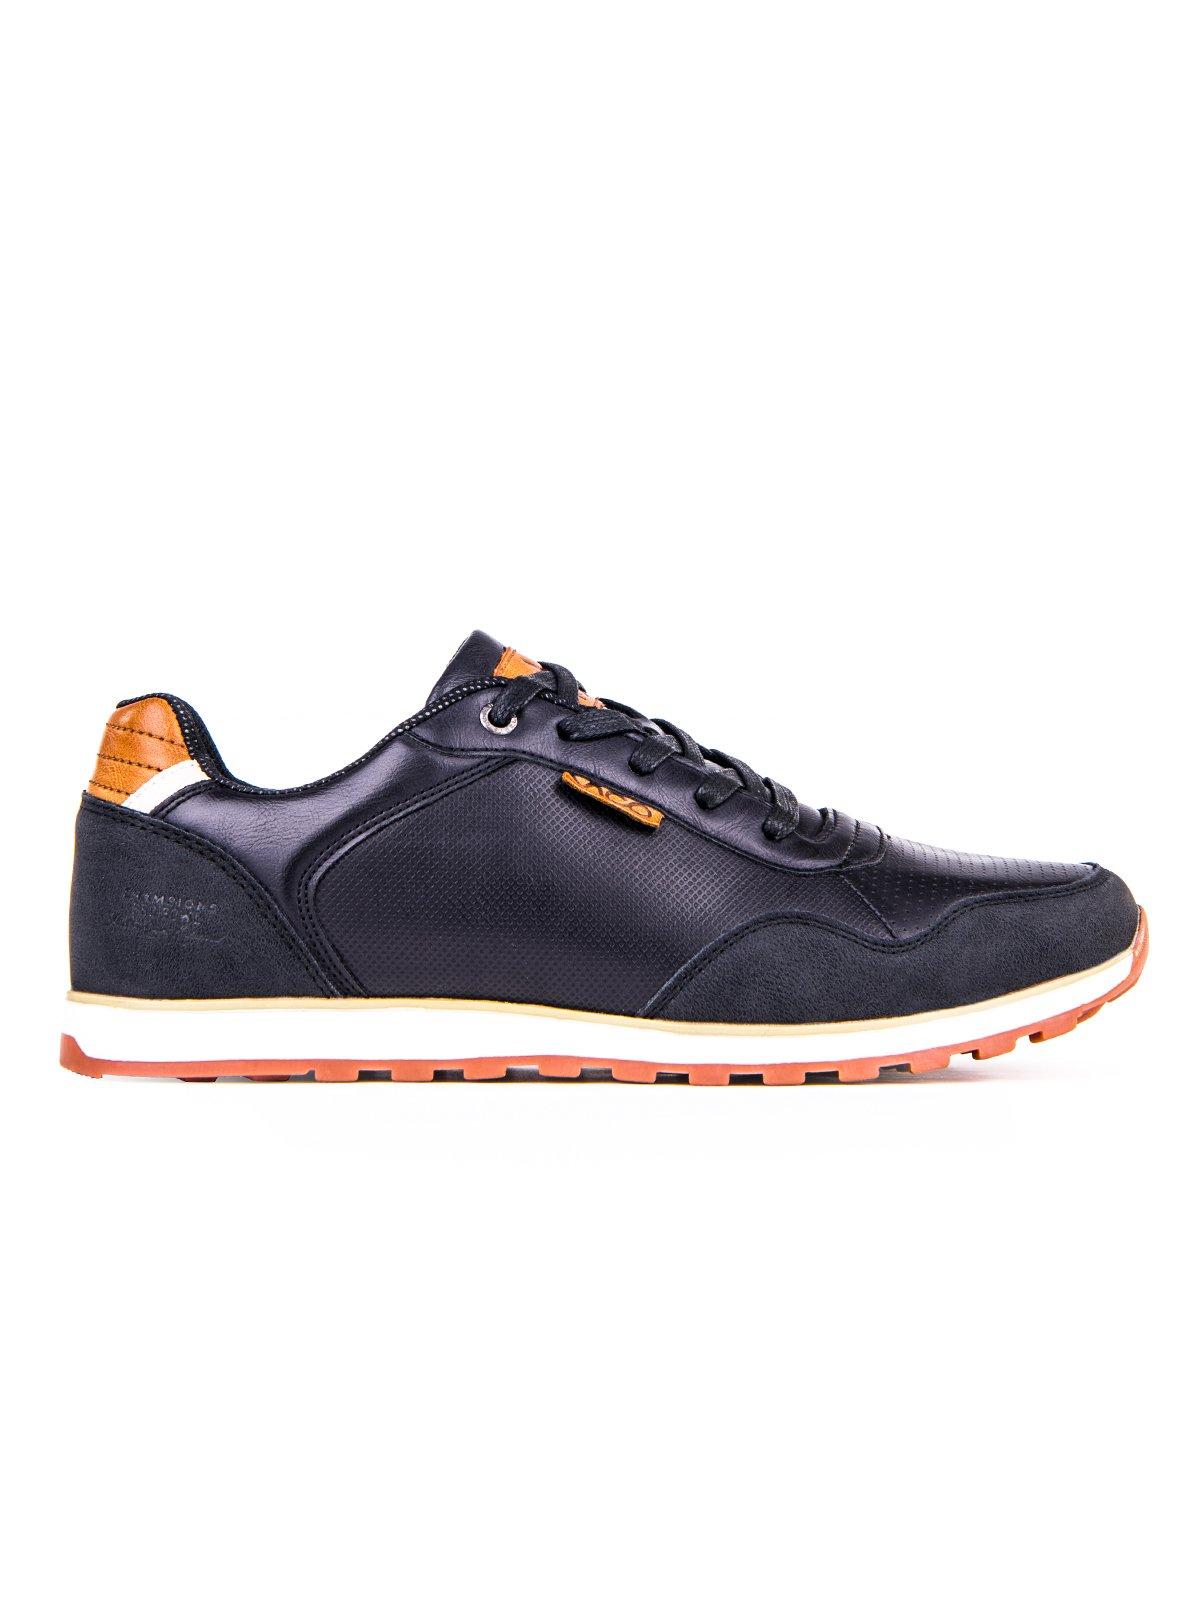 Buty MĘskie Sportowe Sneakersy T073 - Czarne